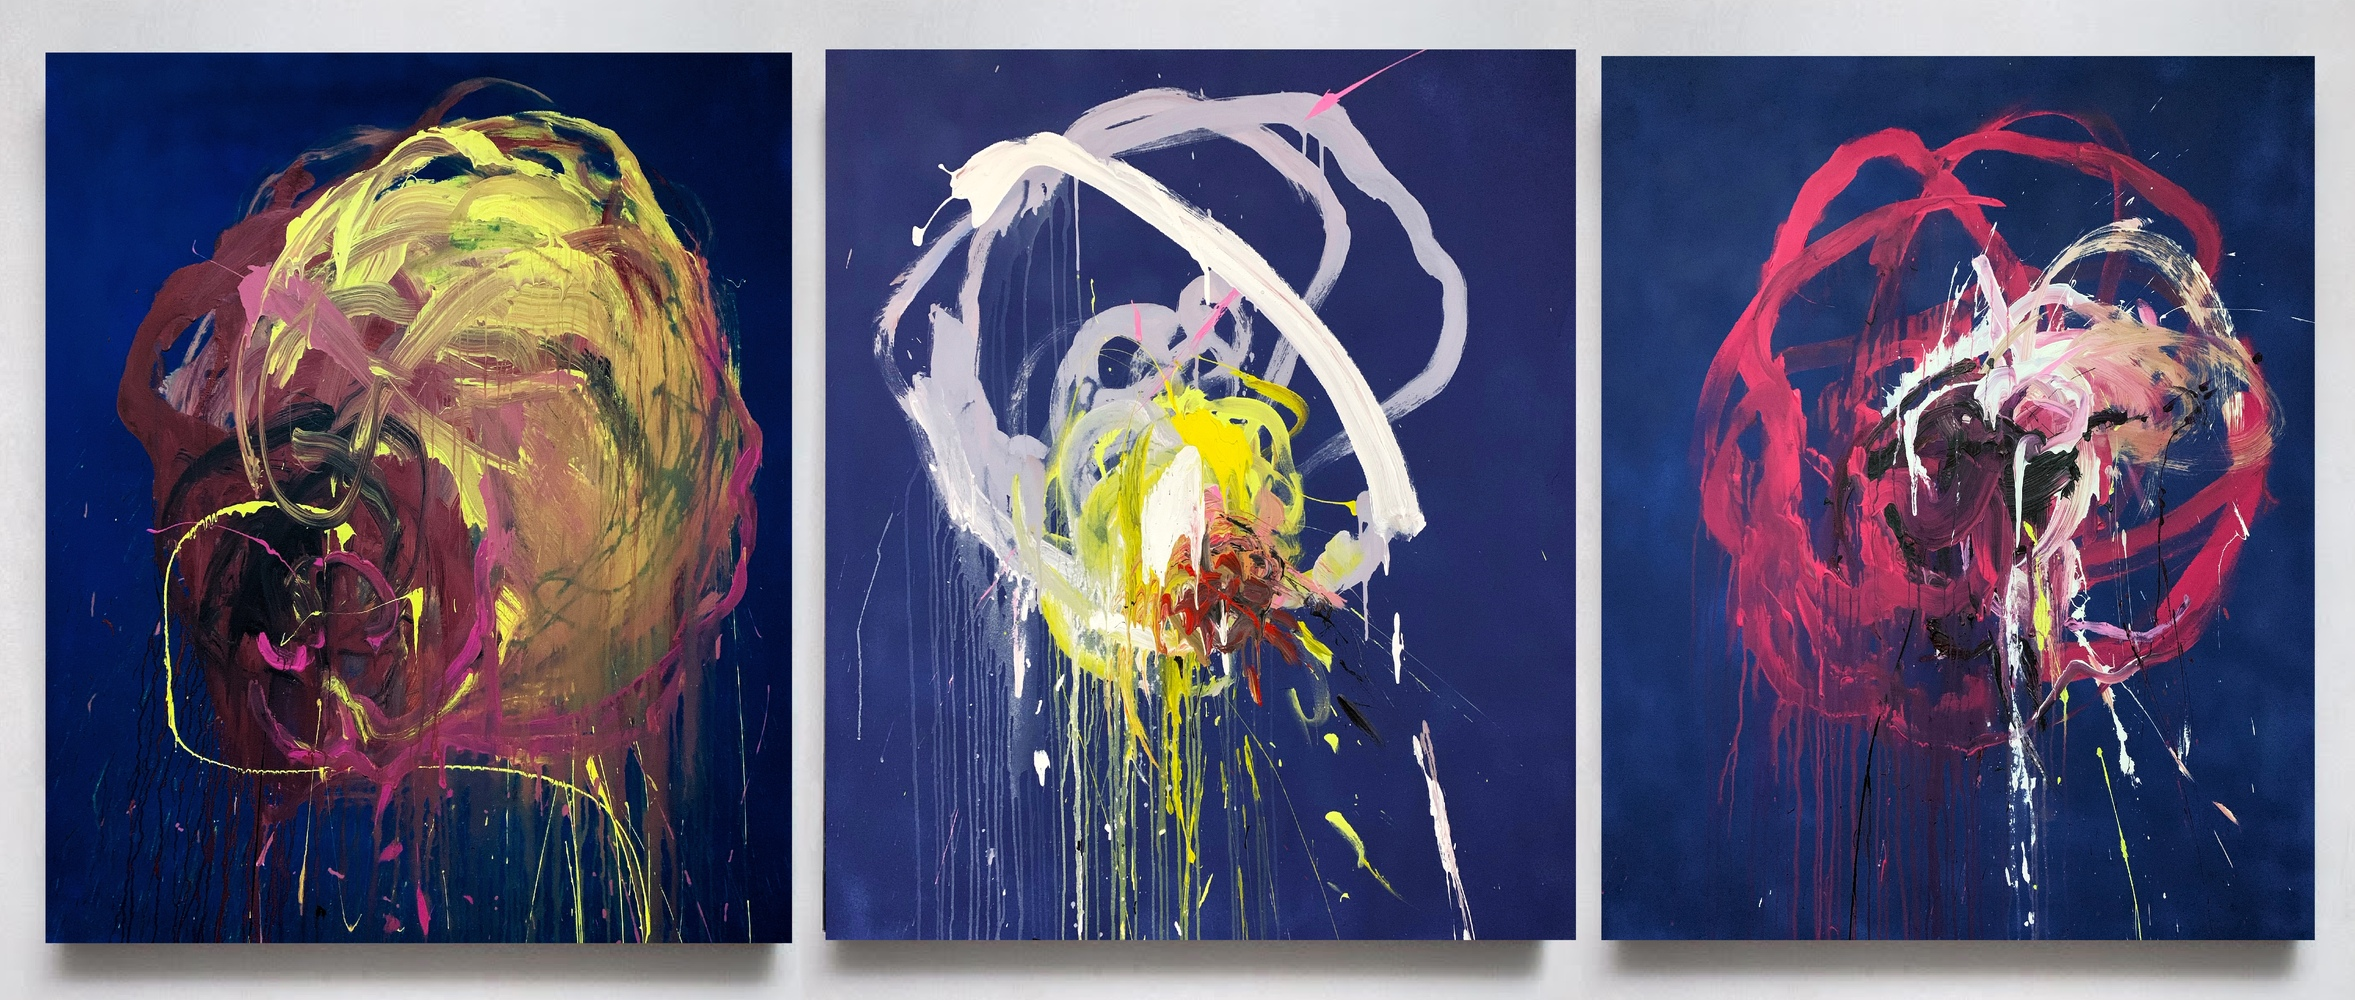 Flowers Triptych artwork by Viktoriia Dmytriv - art listed for sale on Artplode